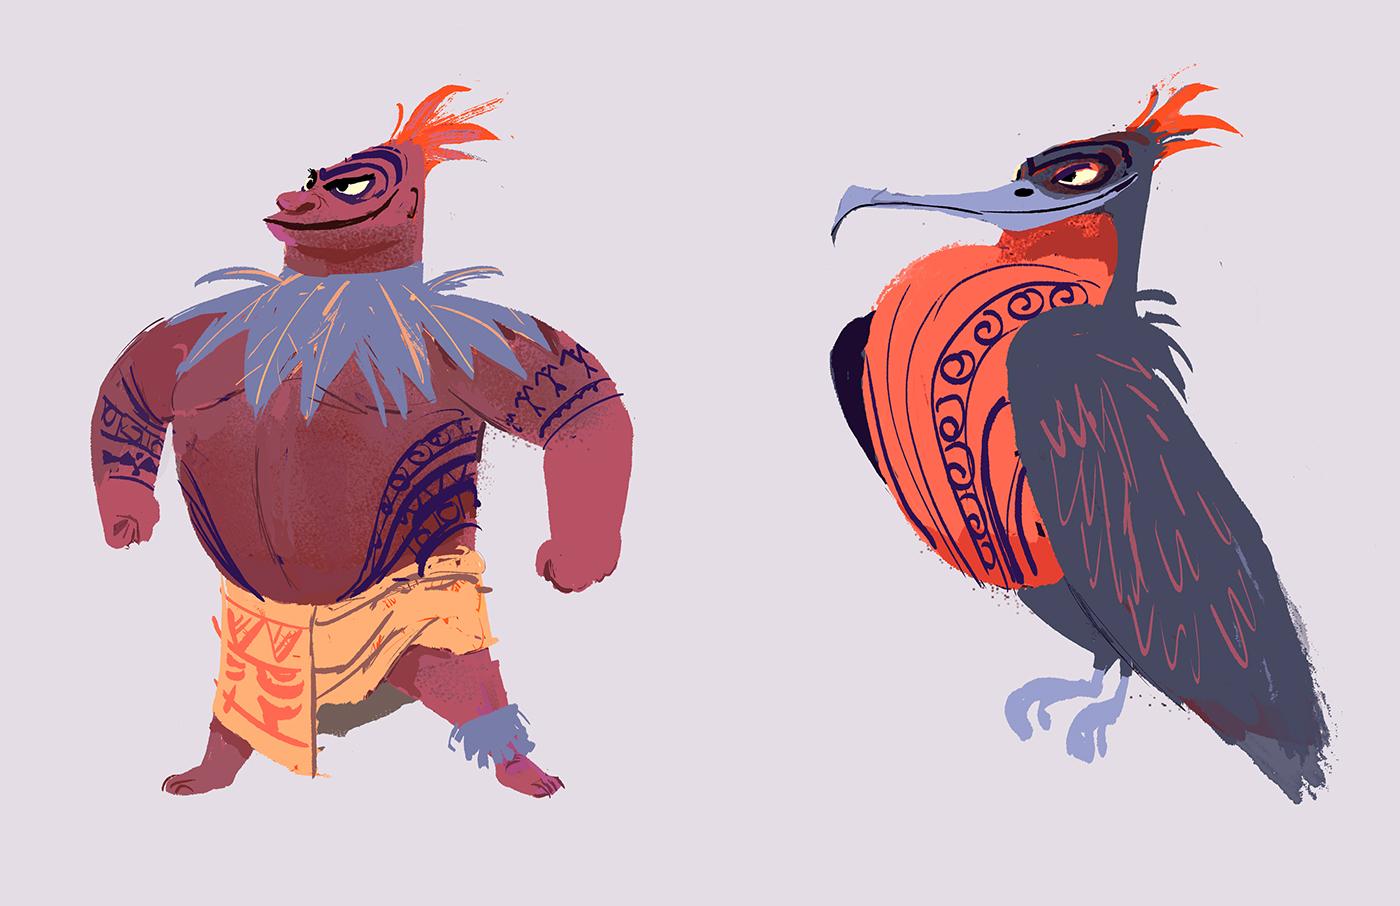 Moana Disney Character Design : Moana character designs on behance